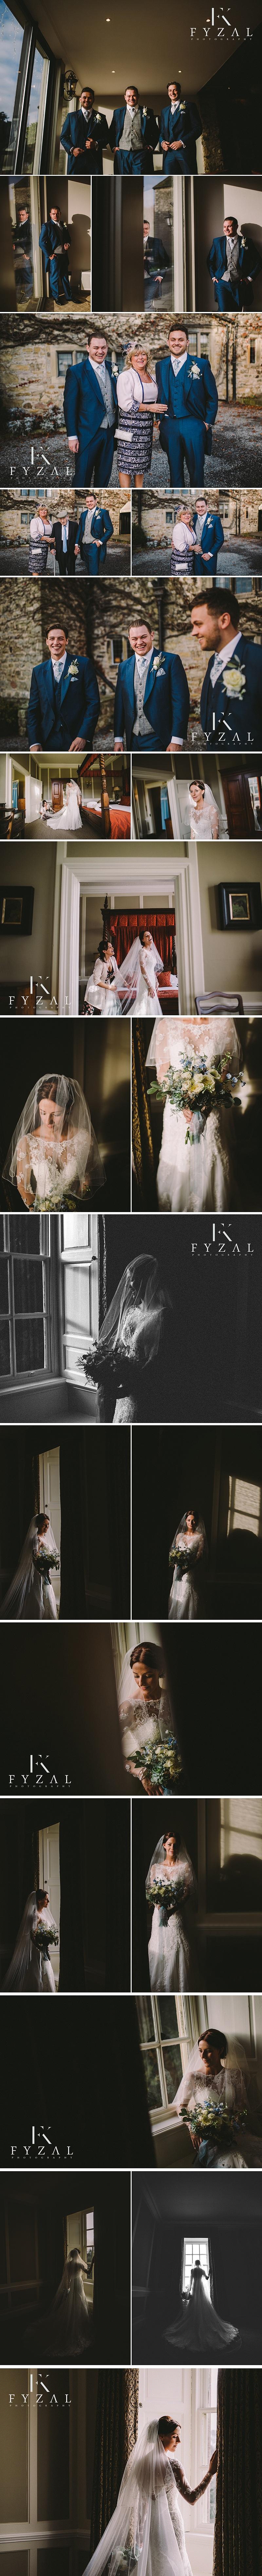 161203-Ellie-Simon-Wedding-03.jpg